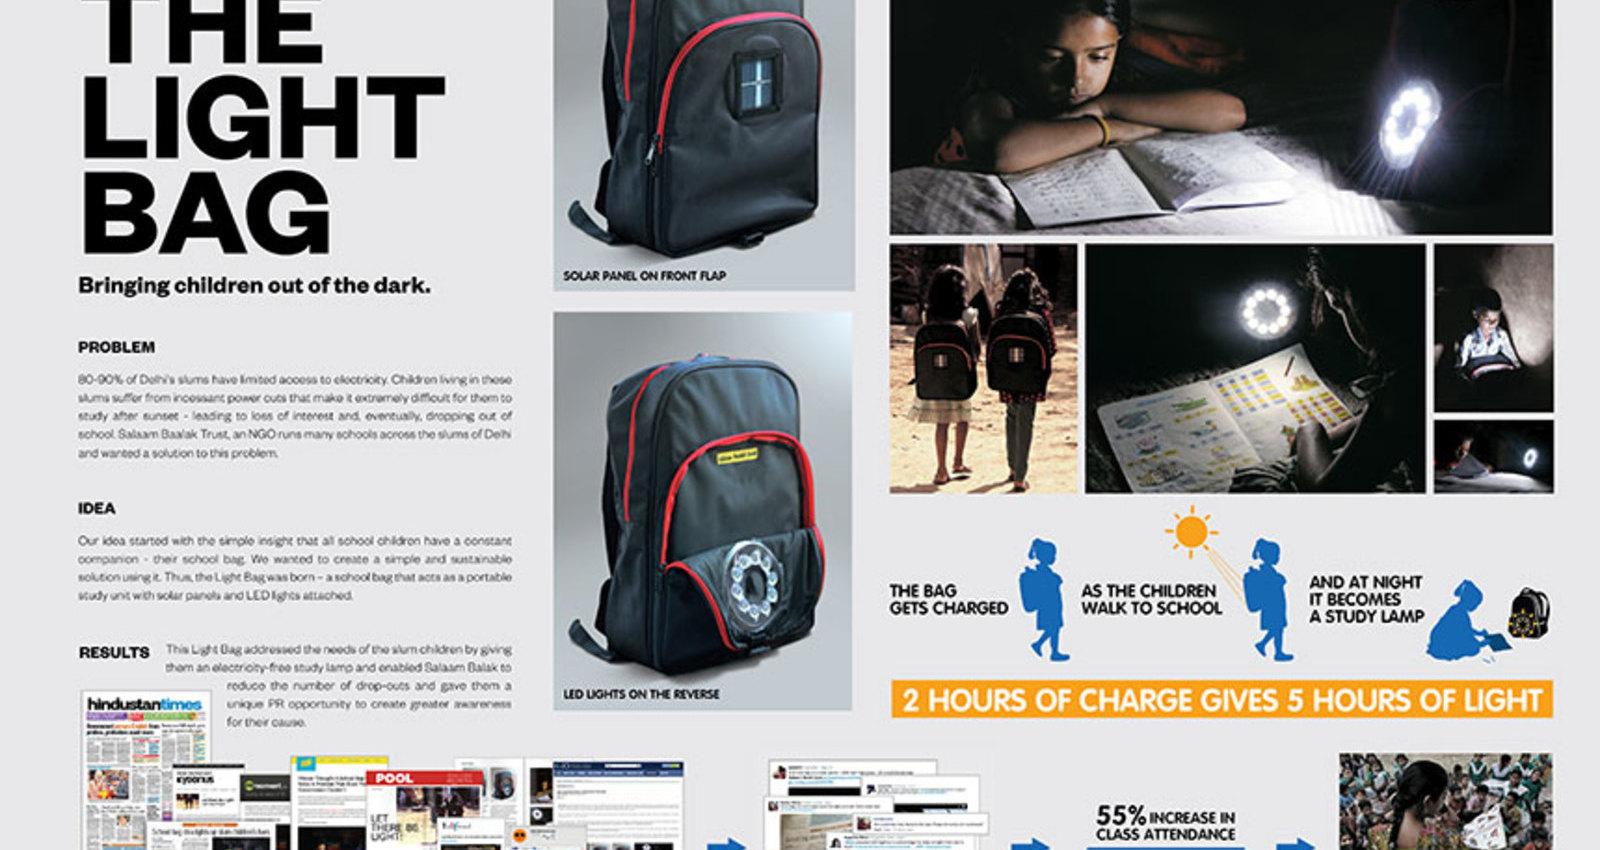 The Light Bag